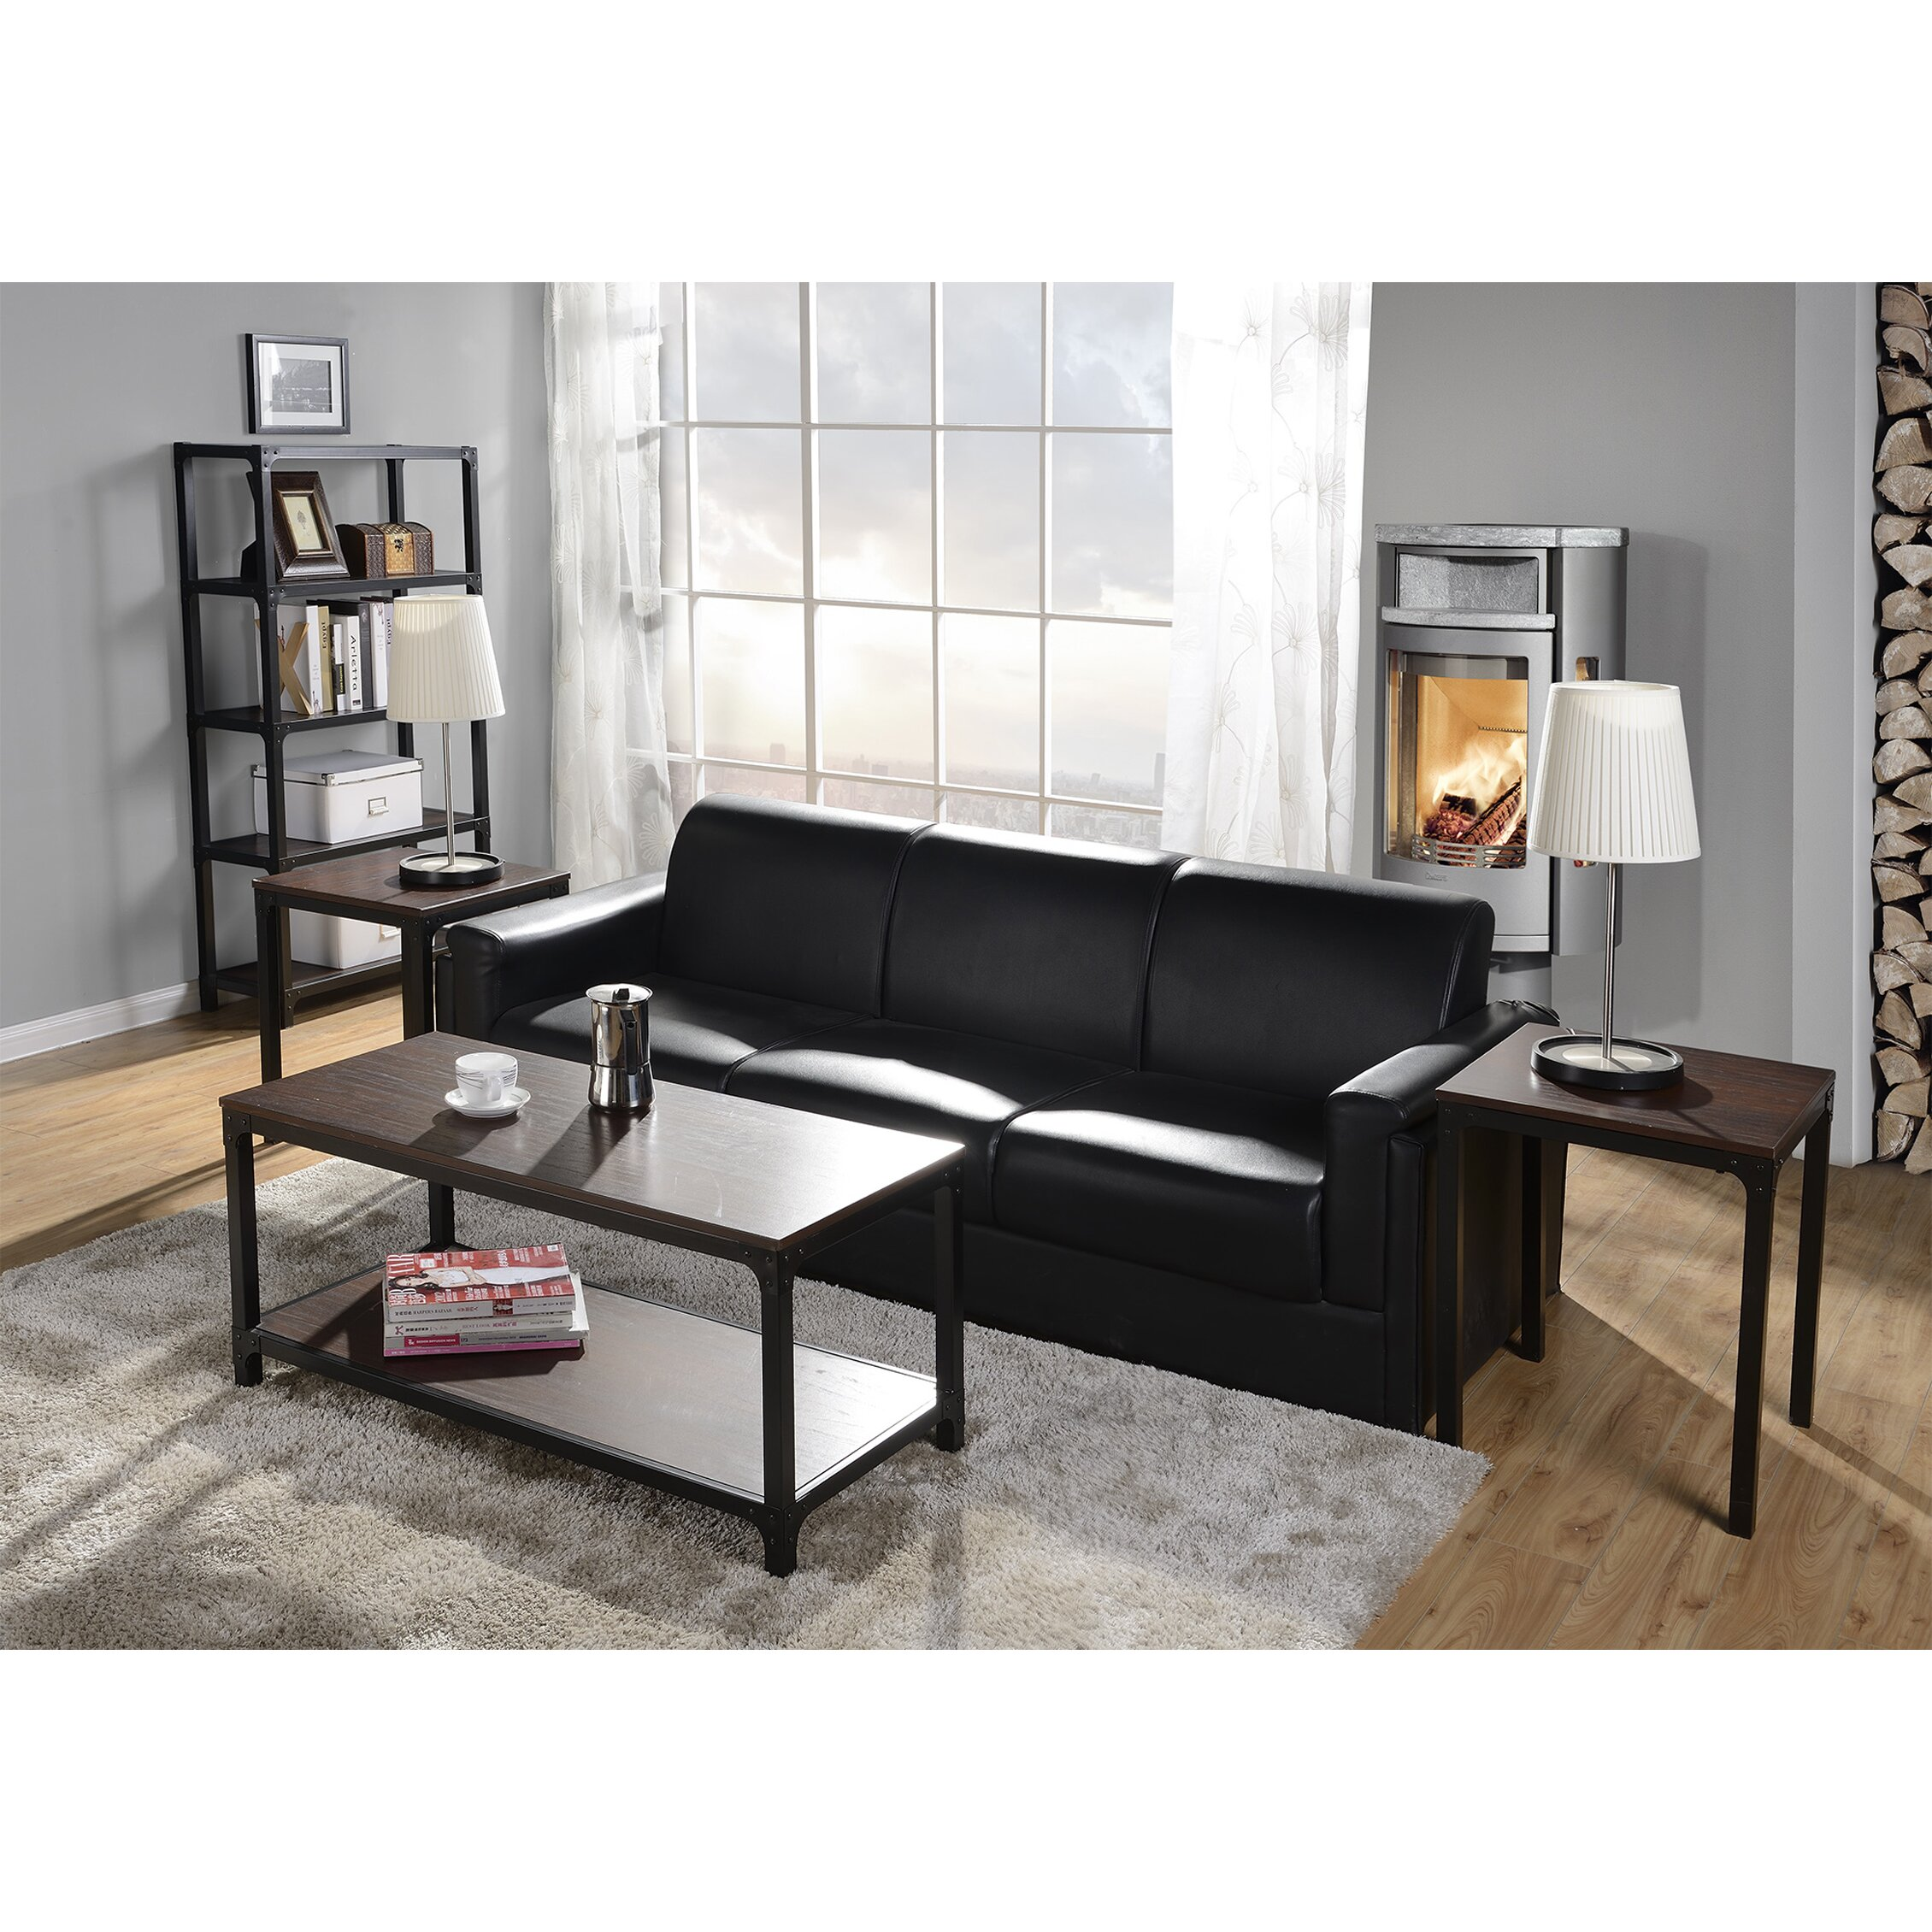 Three Piece Living Room Table Set Homestar 3 Piece Coffee Table Set Reviews Wayfair